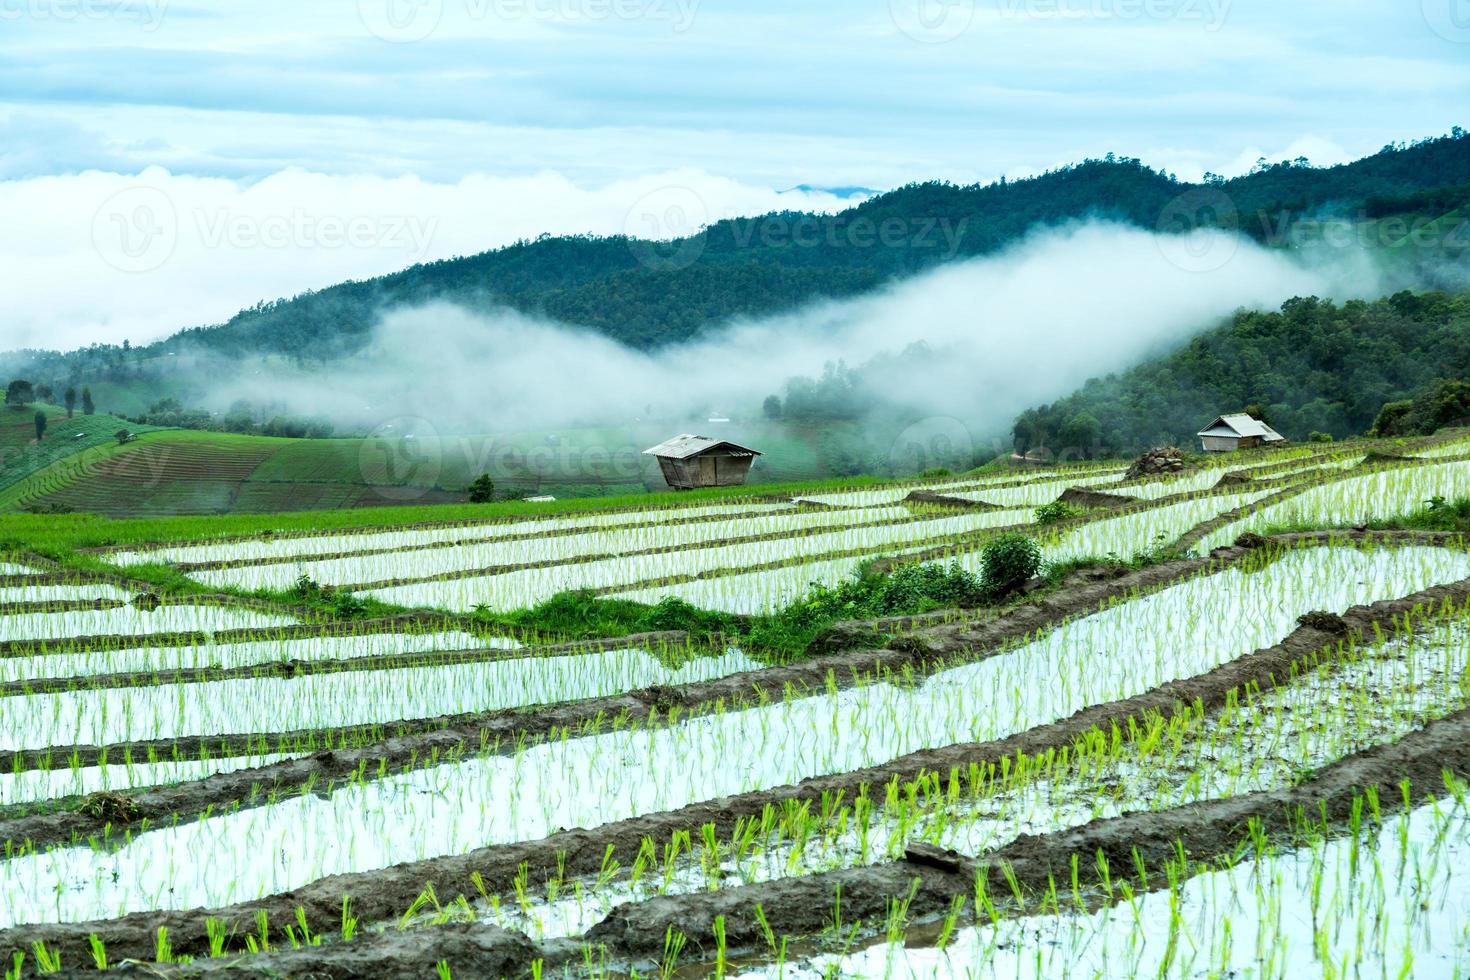 traditionellt jordbruk i cheing mai, norra Thailand. foto